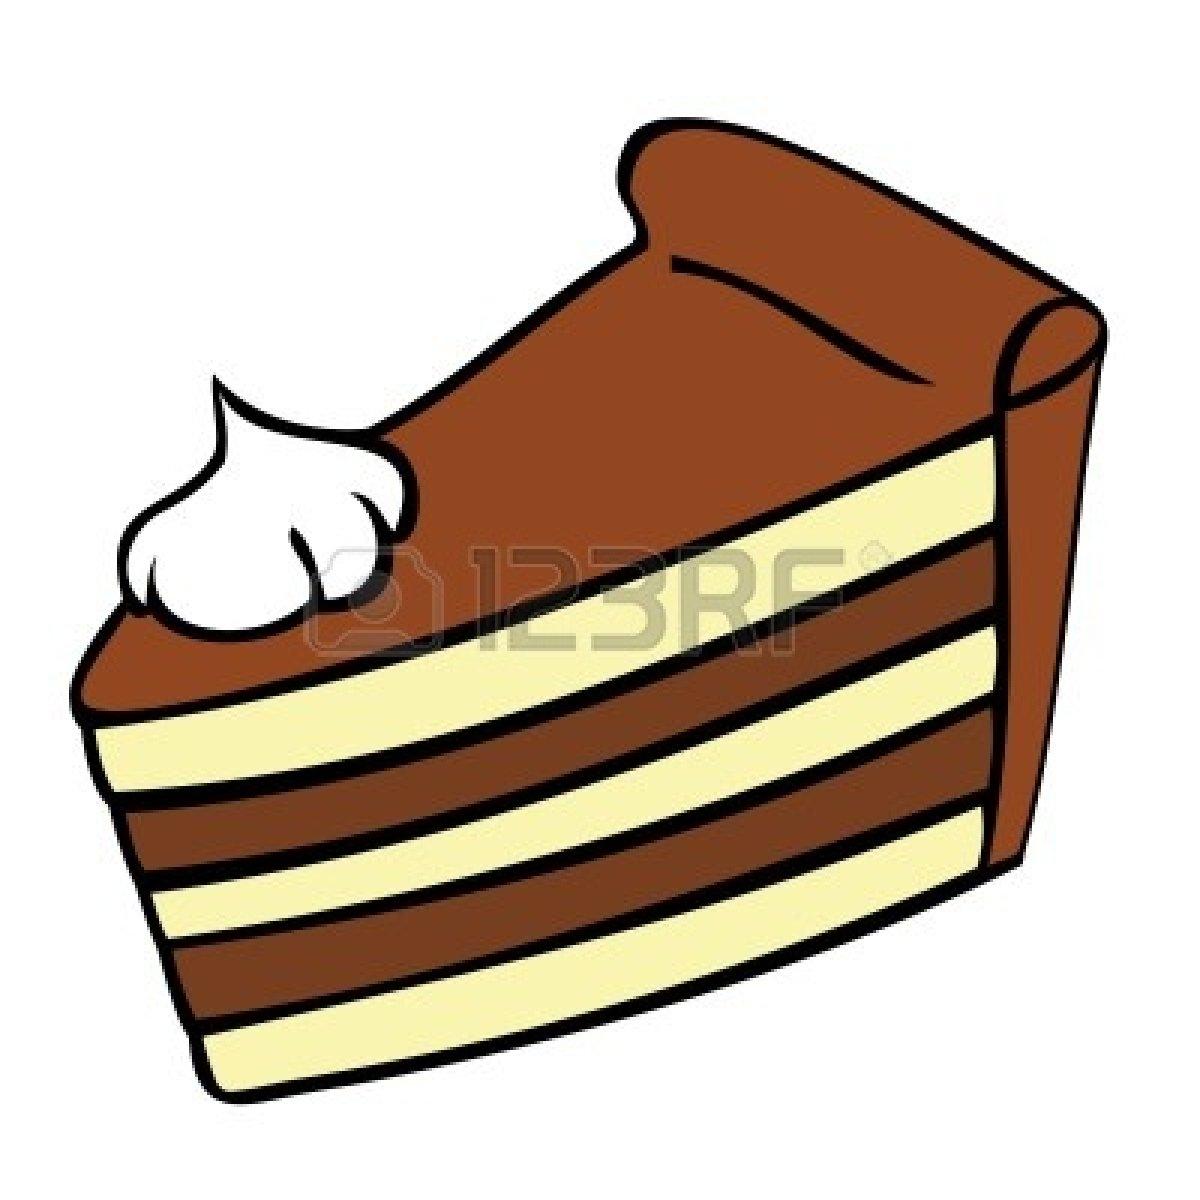 Purple slice cake art clipart clipart freeuse download Purple slice cake art clipart - ClipartFest clipart freeuse download